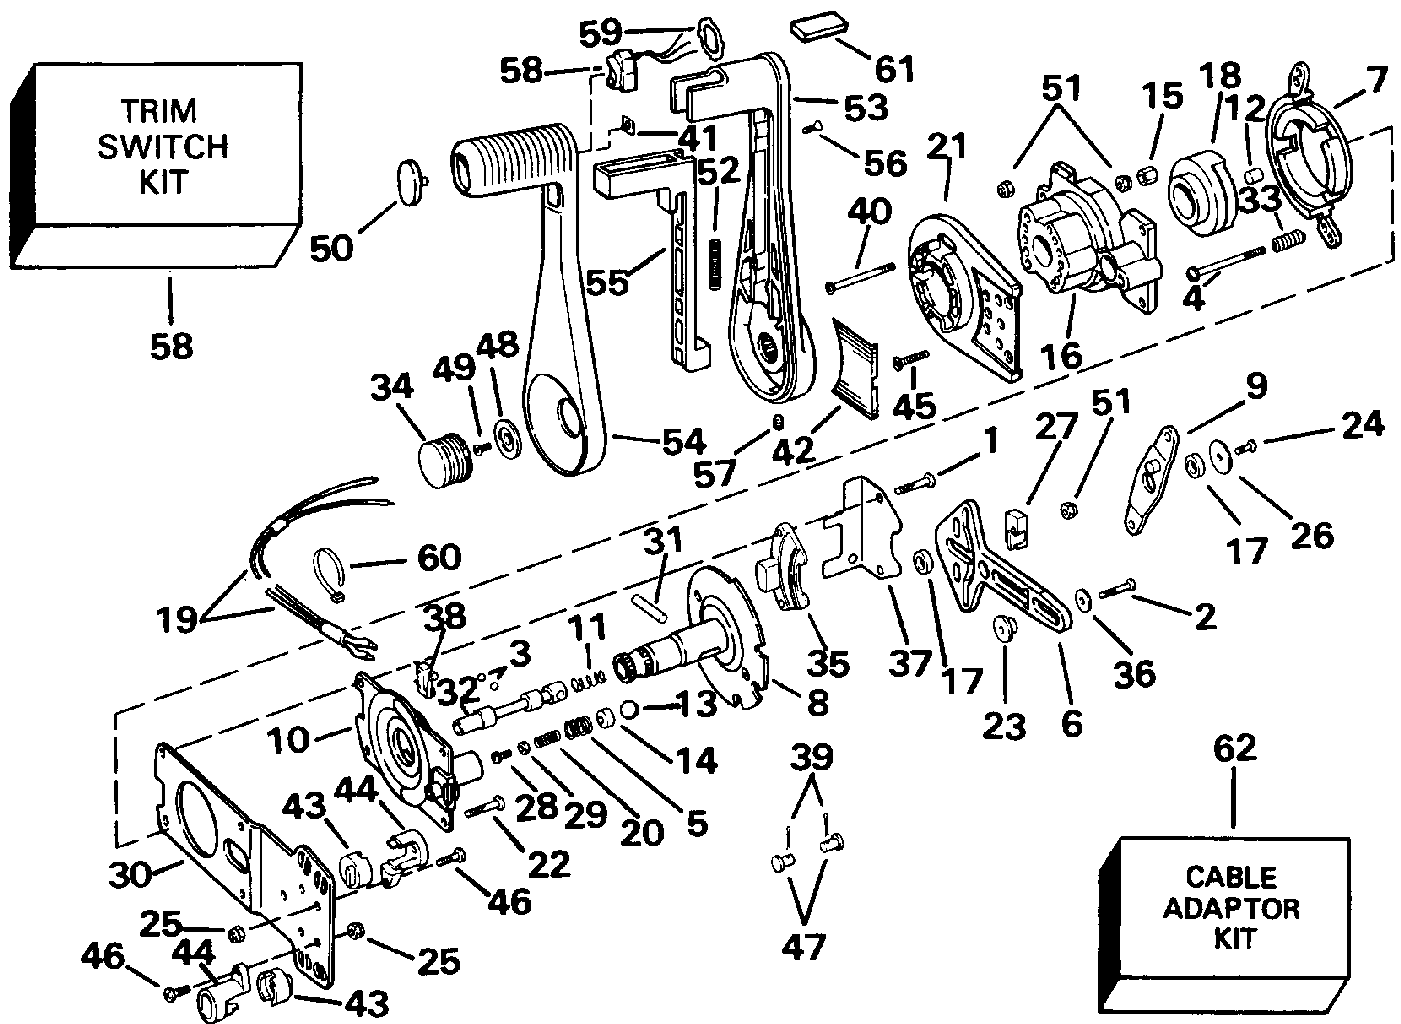 Chevrolet omc co engine wiring diagram on john deere wiring diagram nissan wiring diagram